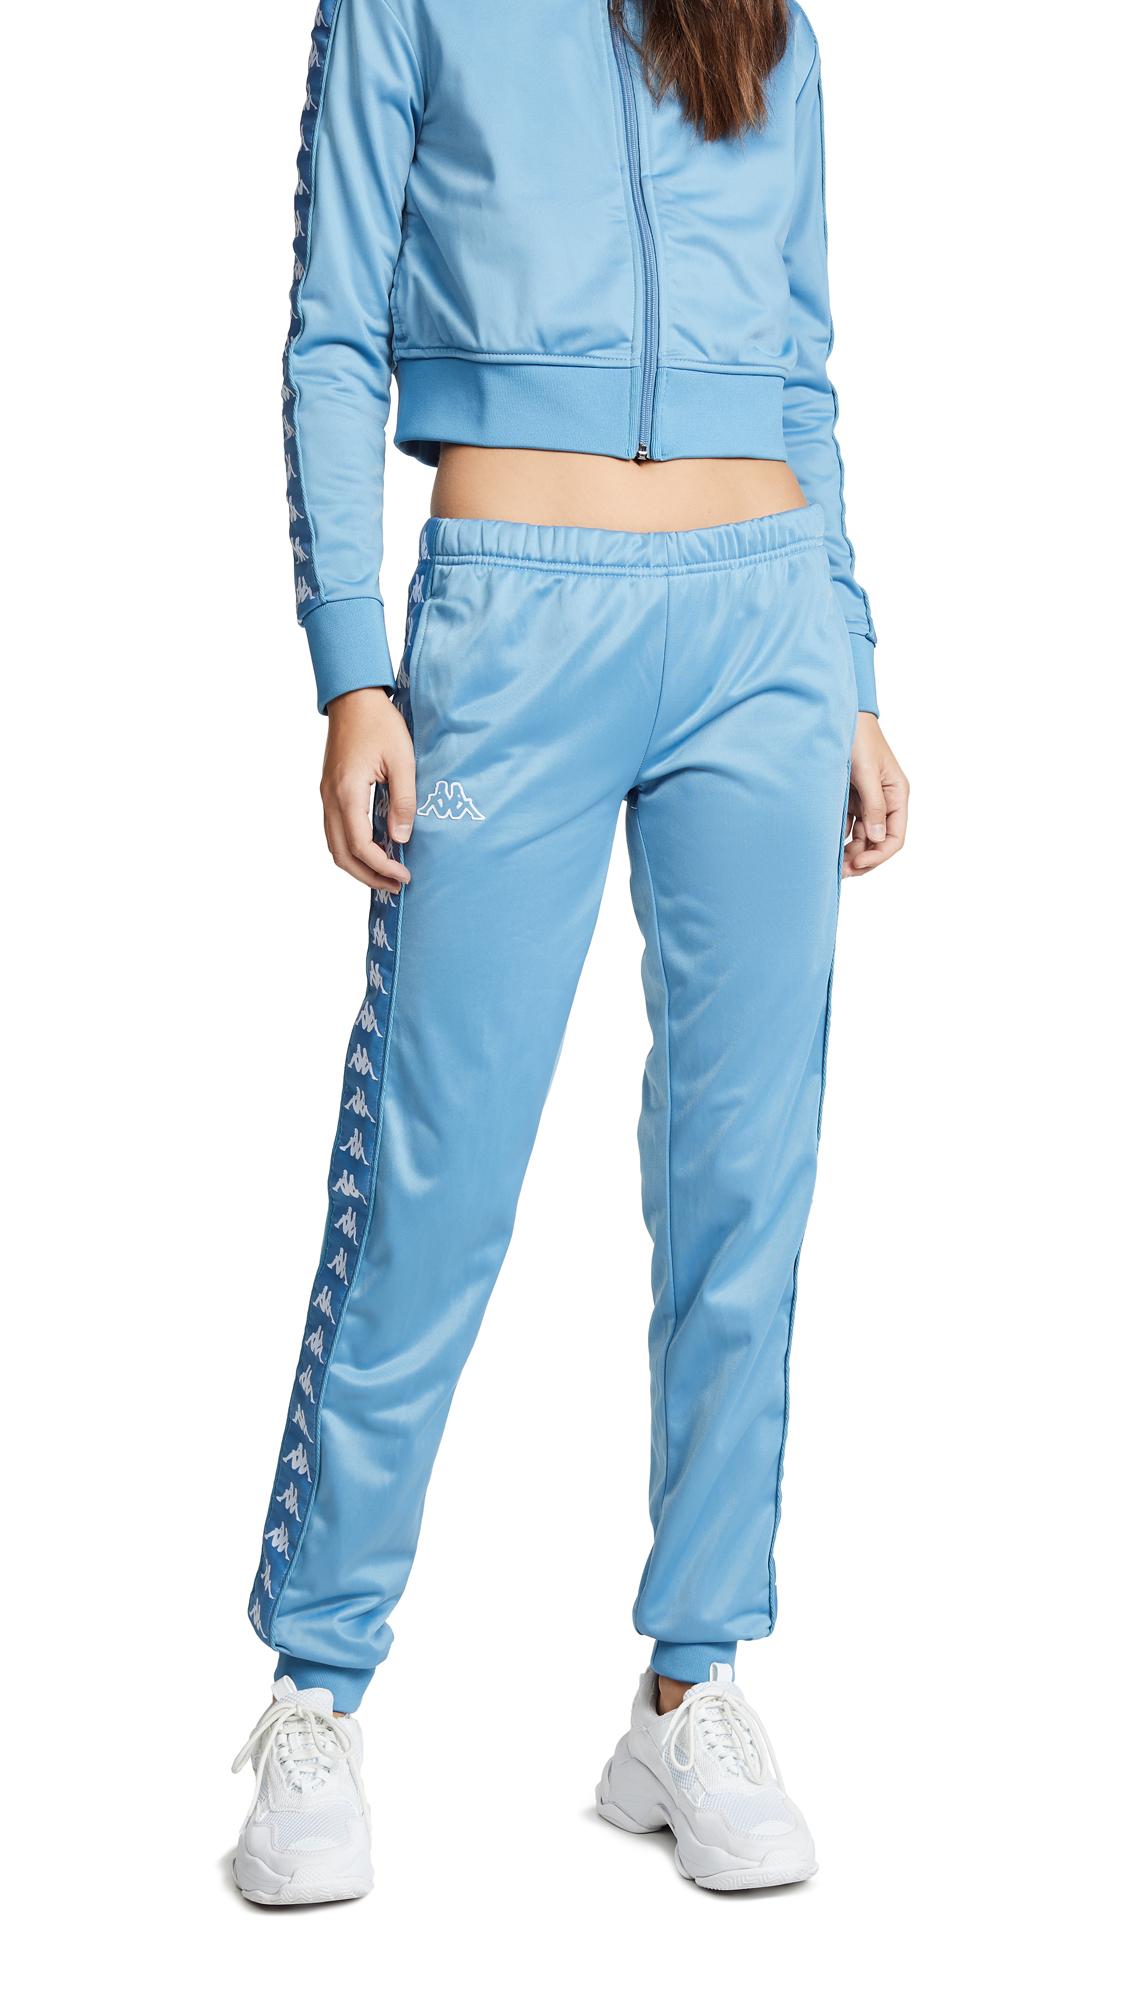 Banda Wrastoria Pants, Blue Cobalt/White